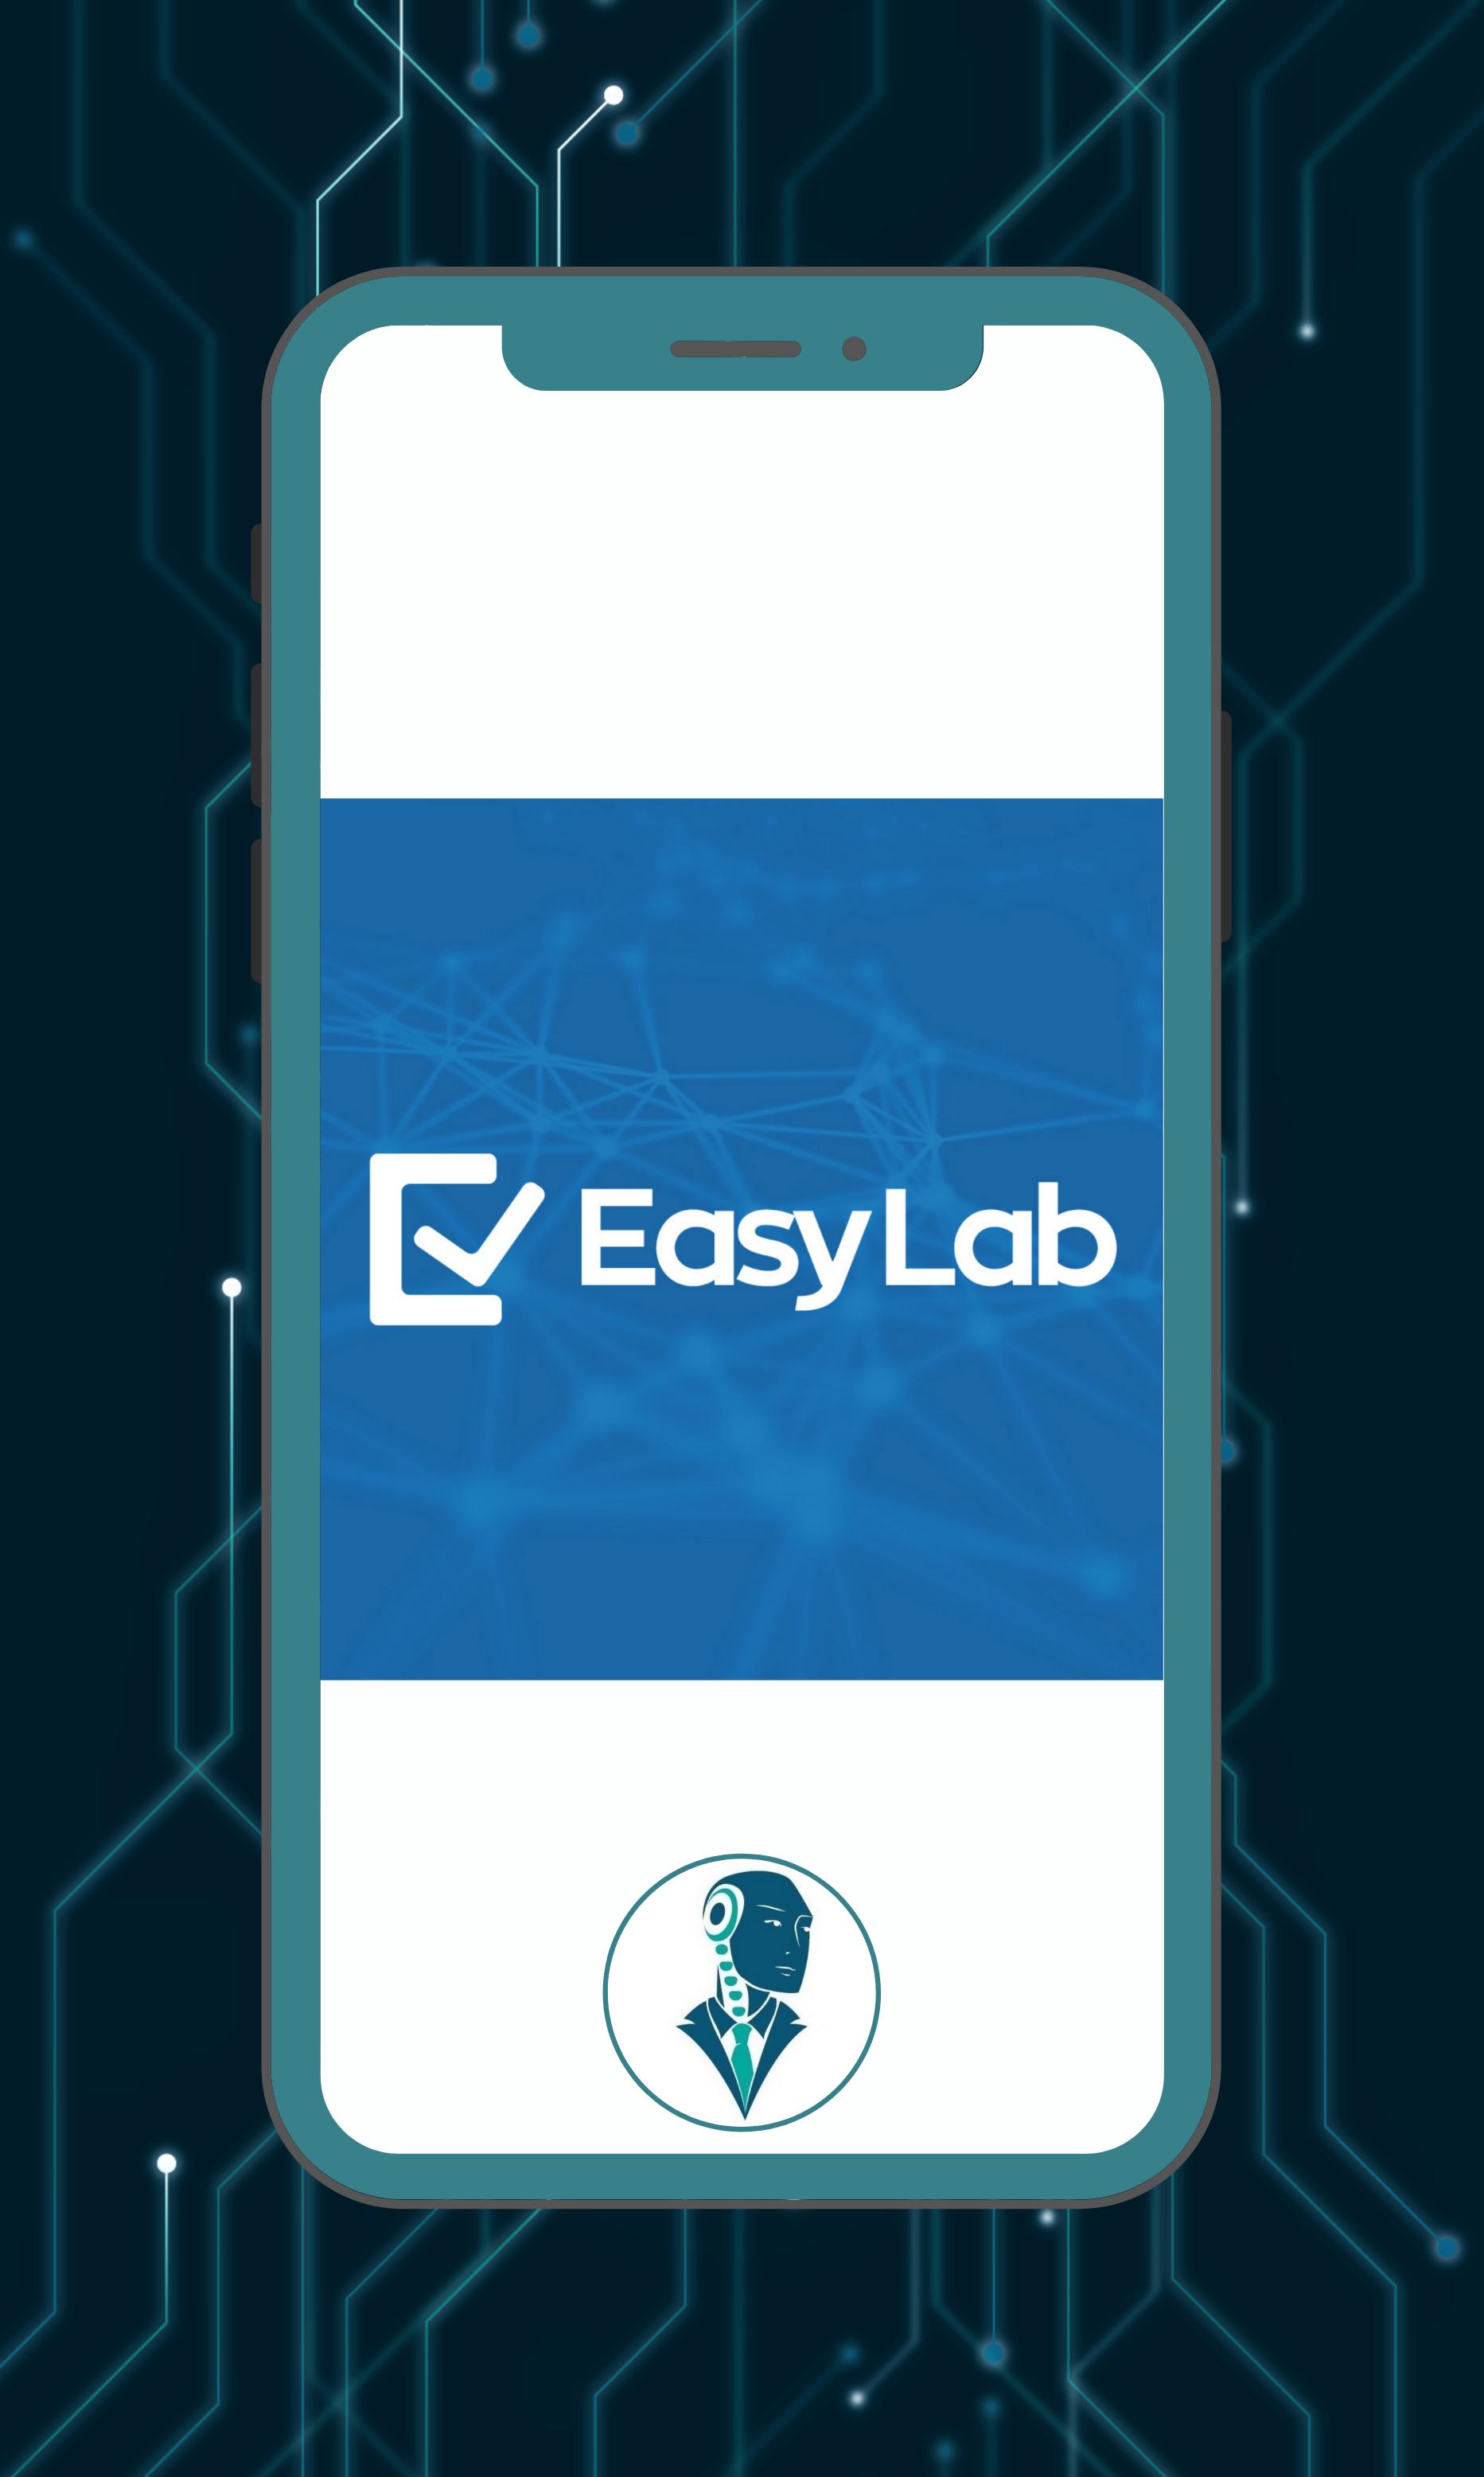 Easy Lab Srl